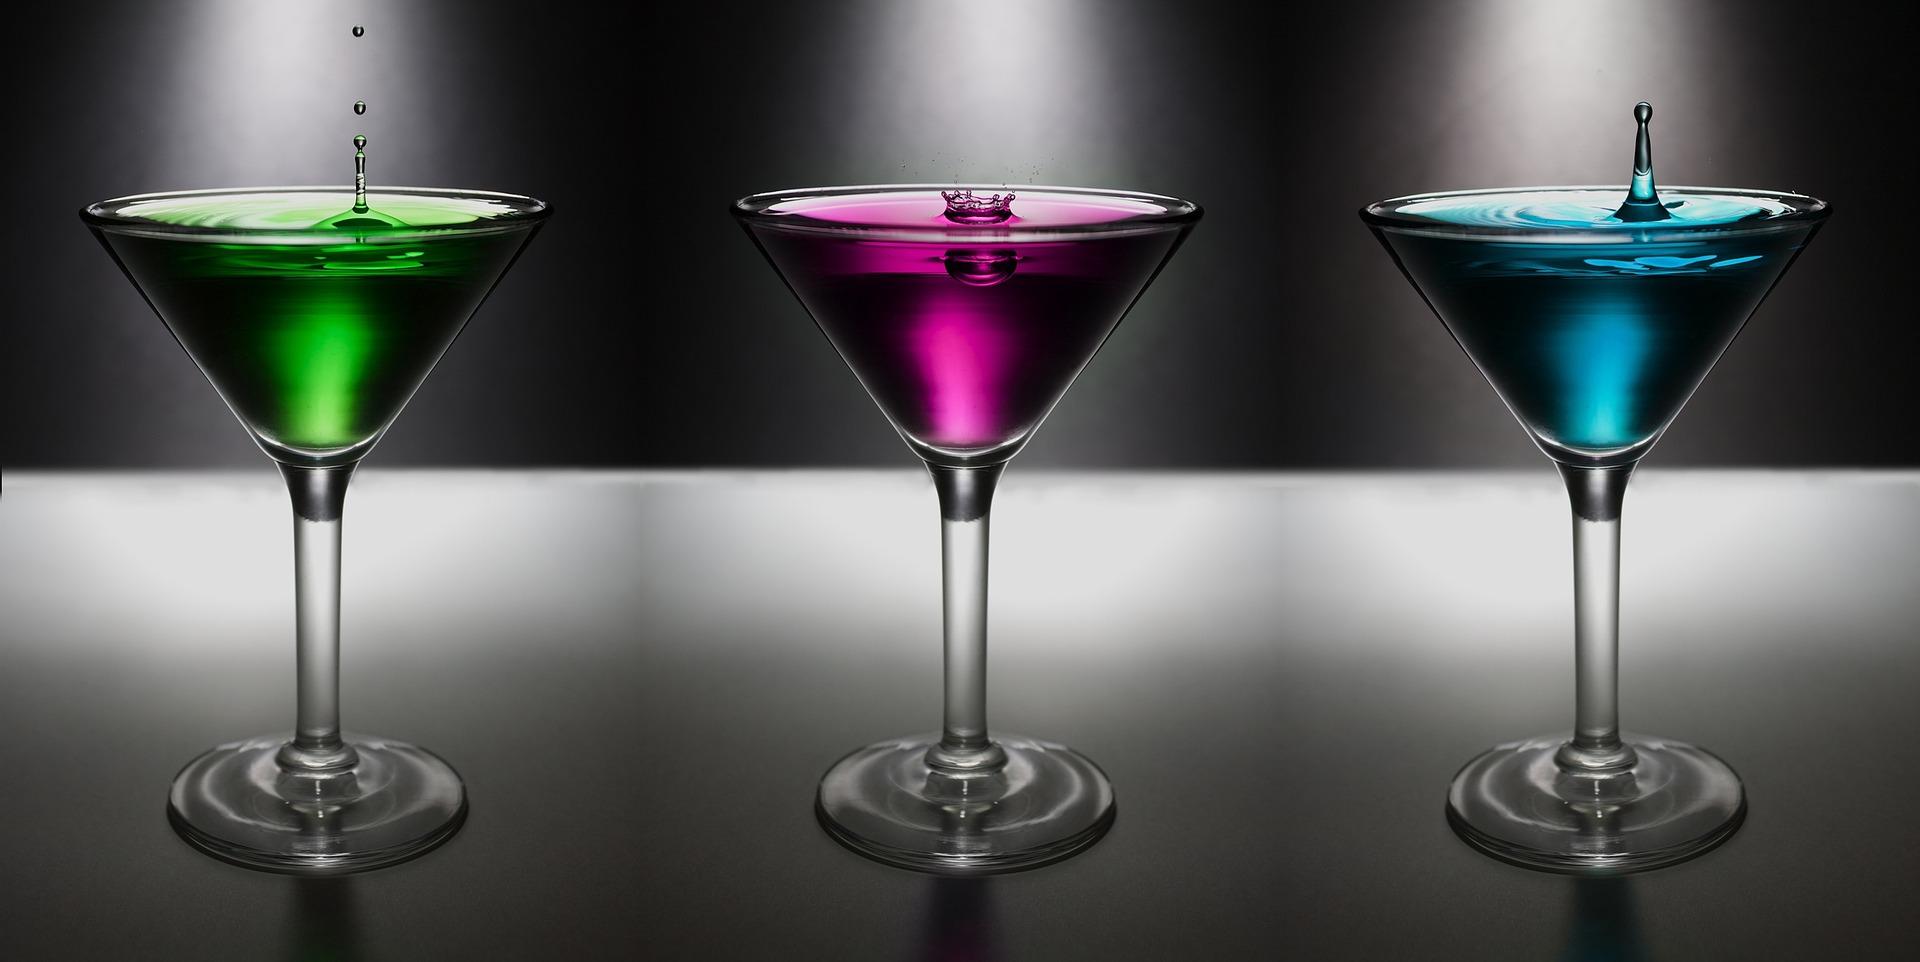 martini-1117932_1920.jpg